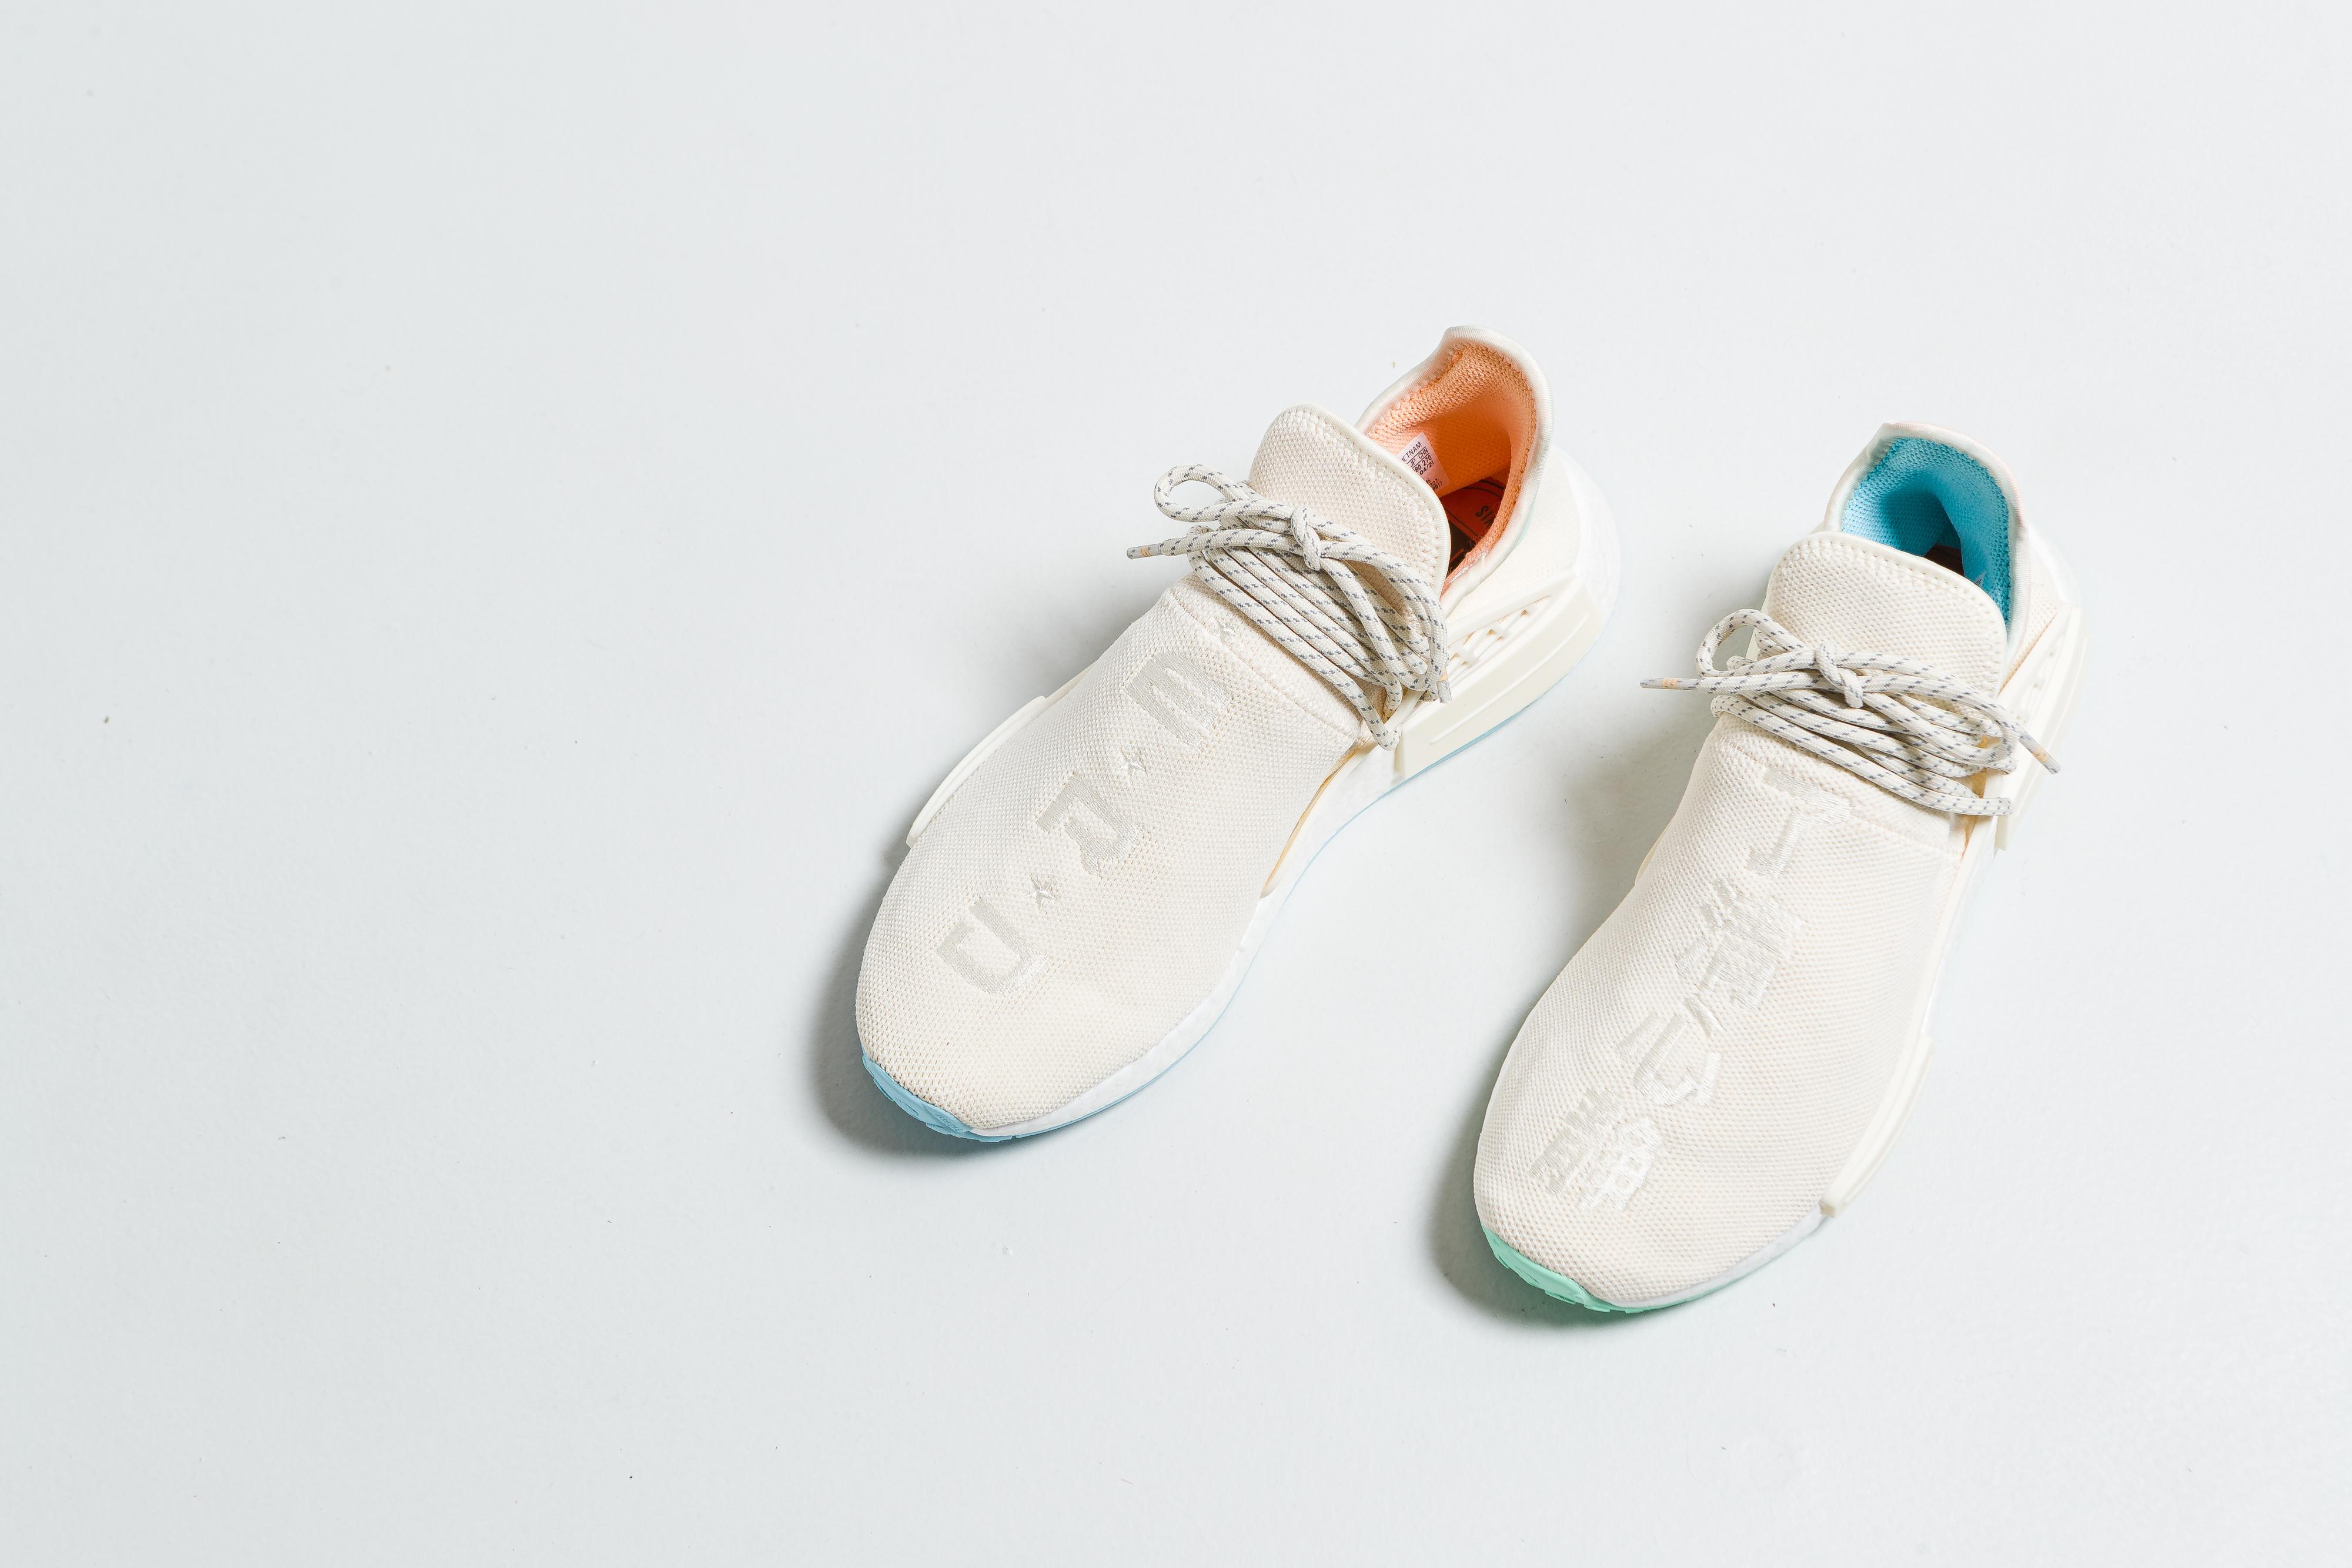 adidas - HU NMD N.E.R.D. - Core White/Glow Orange/Clear Mint - Up There